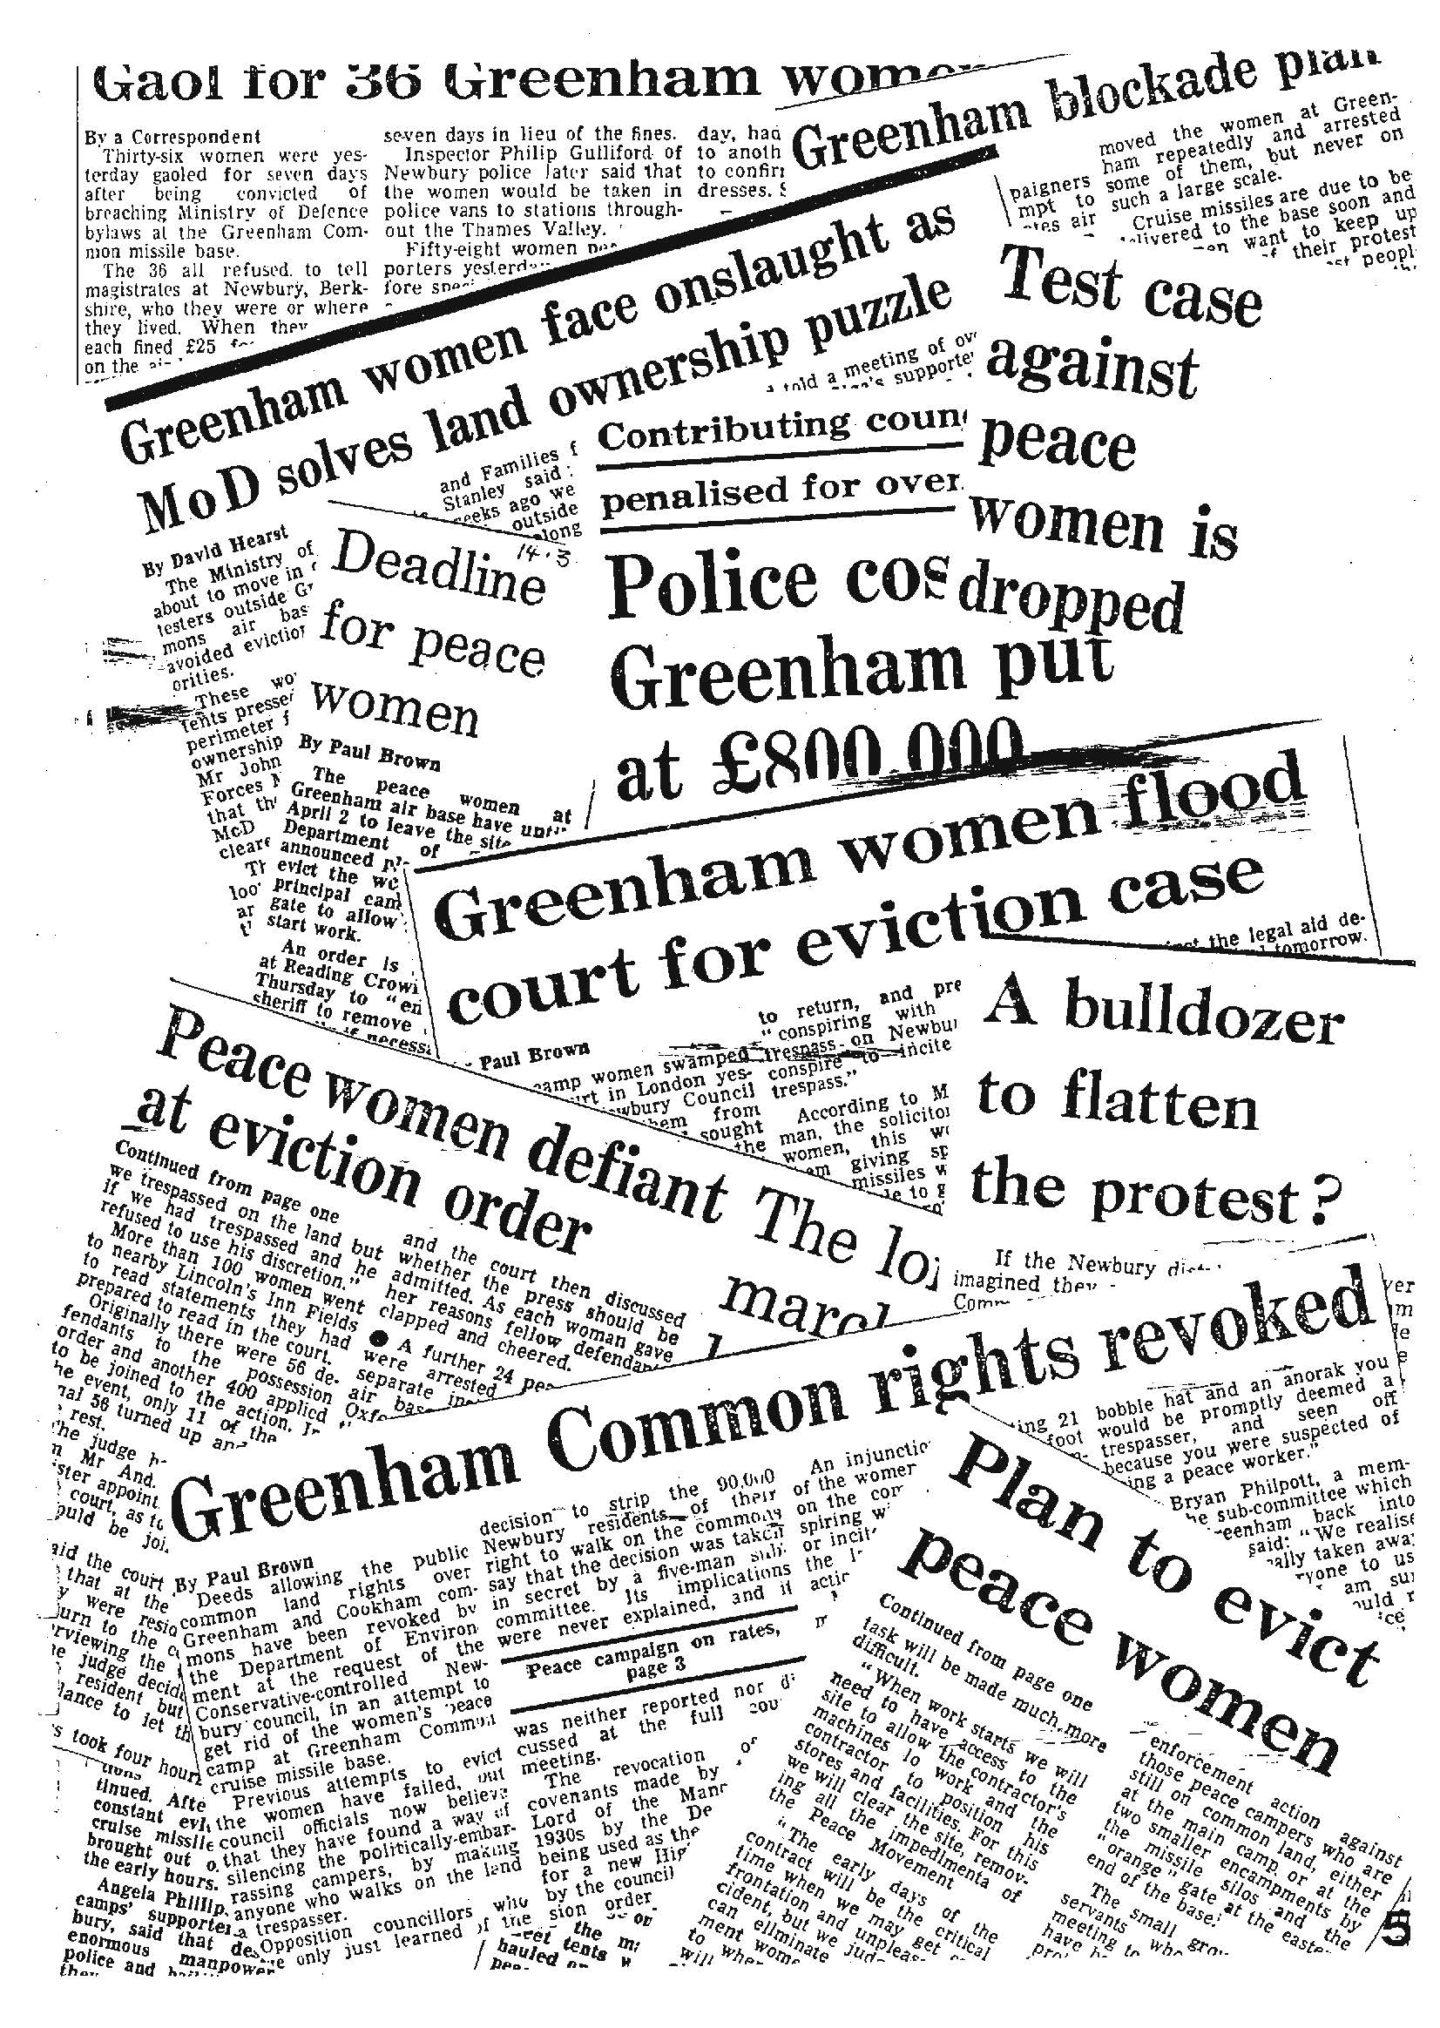 Eviction News (Wiadomości eksmisyjne), Śpiewnik Greenham Common / Greenham Common Songbook